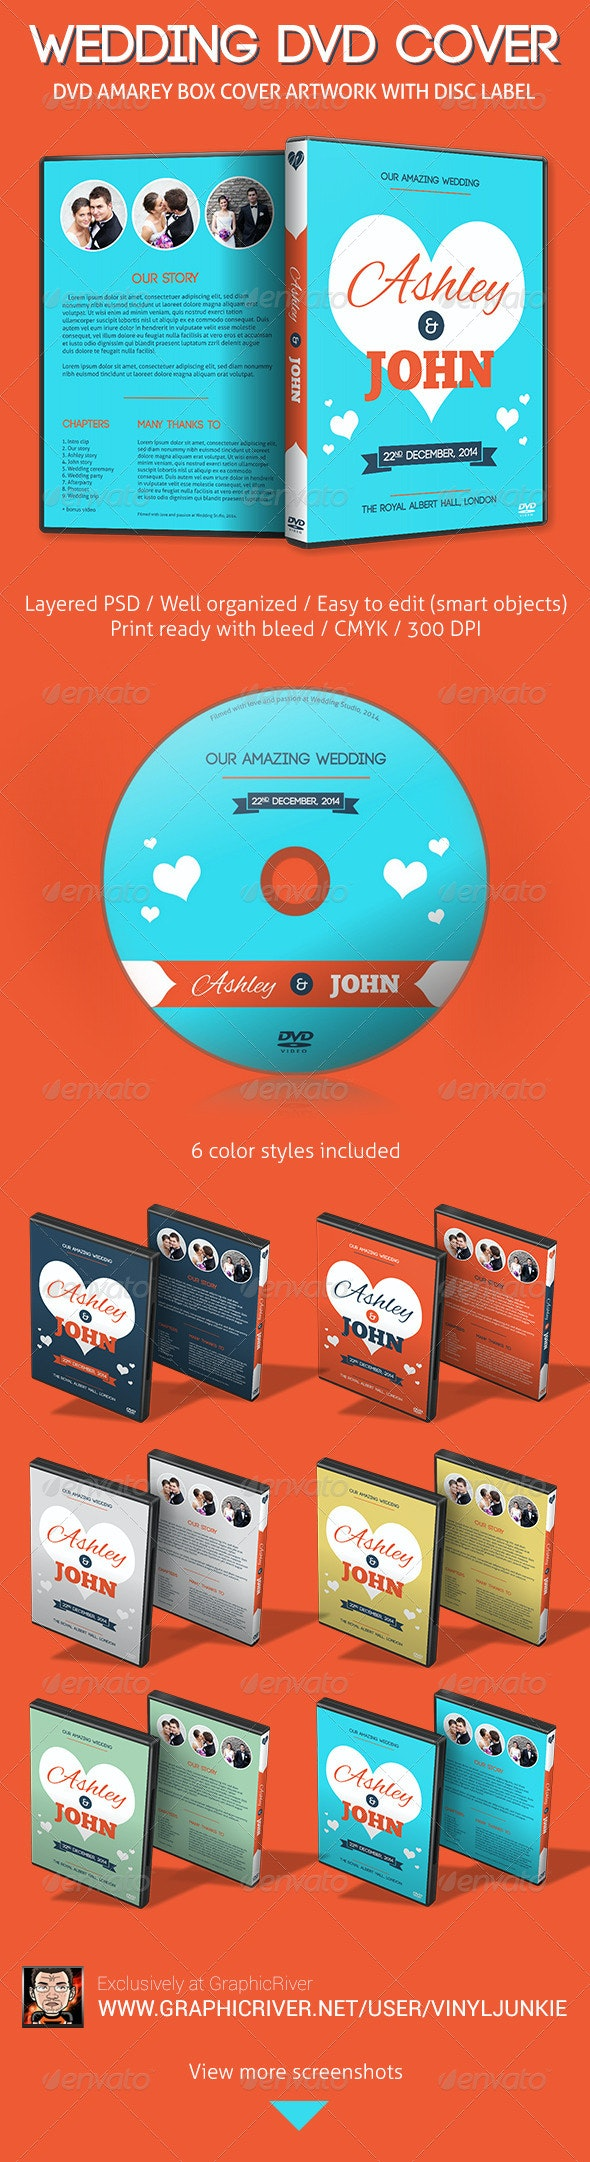 Our Amazing Wedding - DVD Cover Artwork - CD & DVD Artwork Print Templates